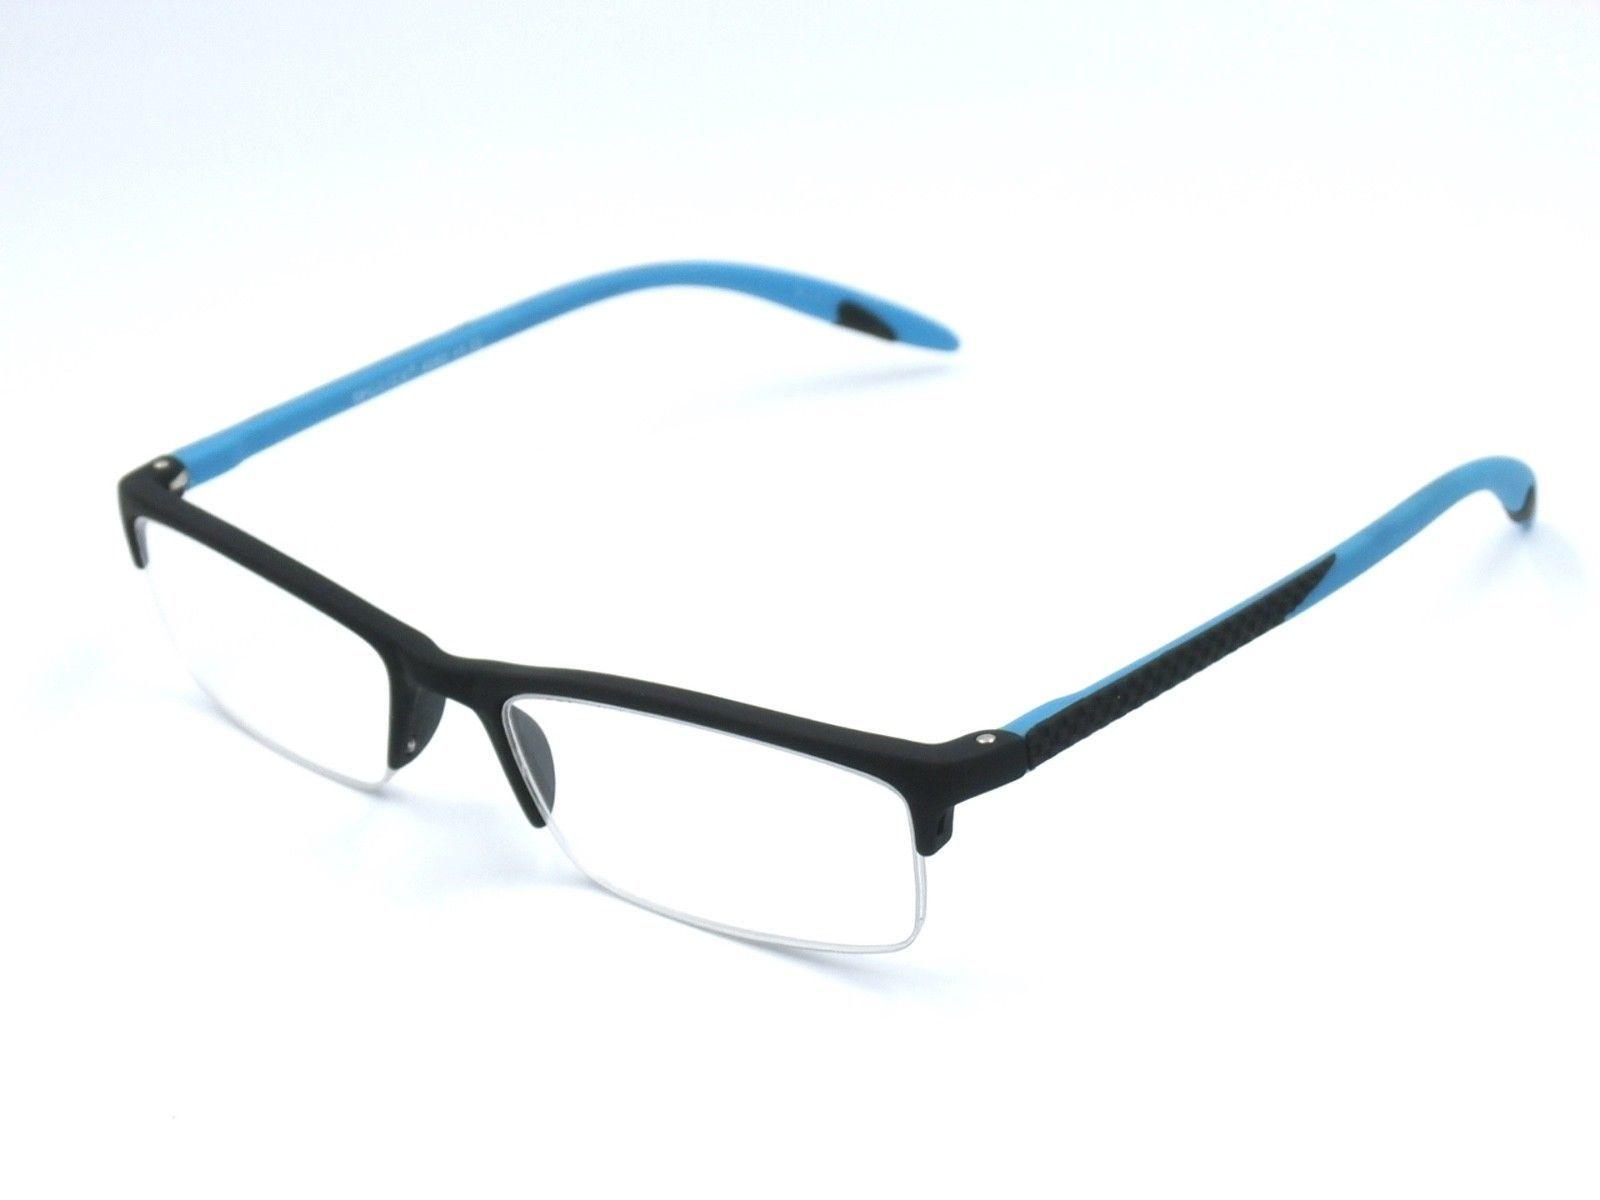 31aa19100ea Select-A-Vision Sportex 4050 +1.25 Reading and 50 similar items